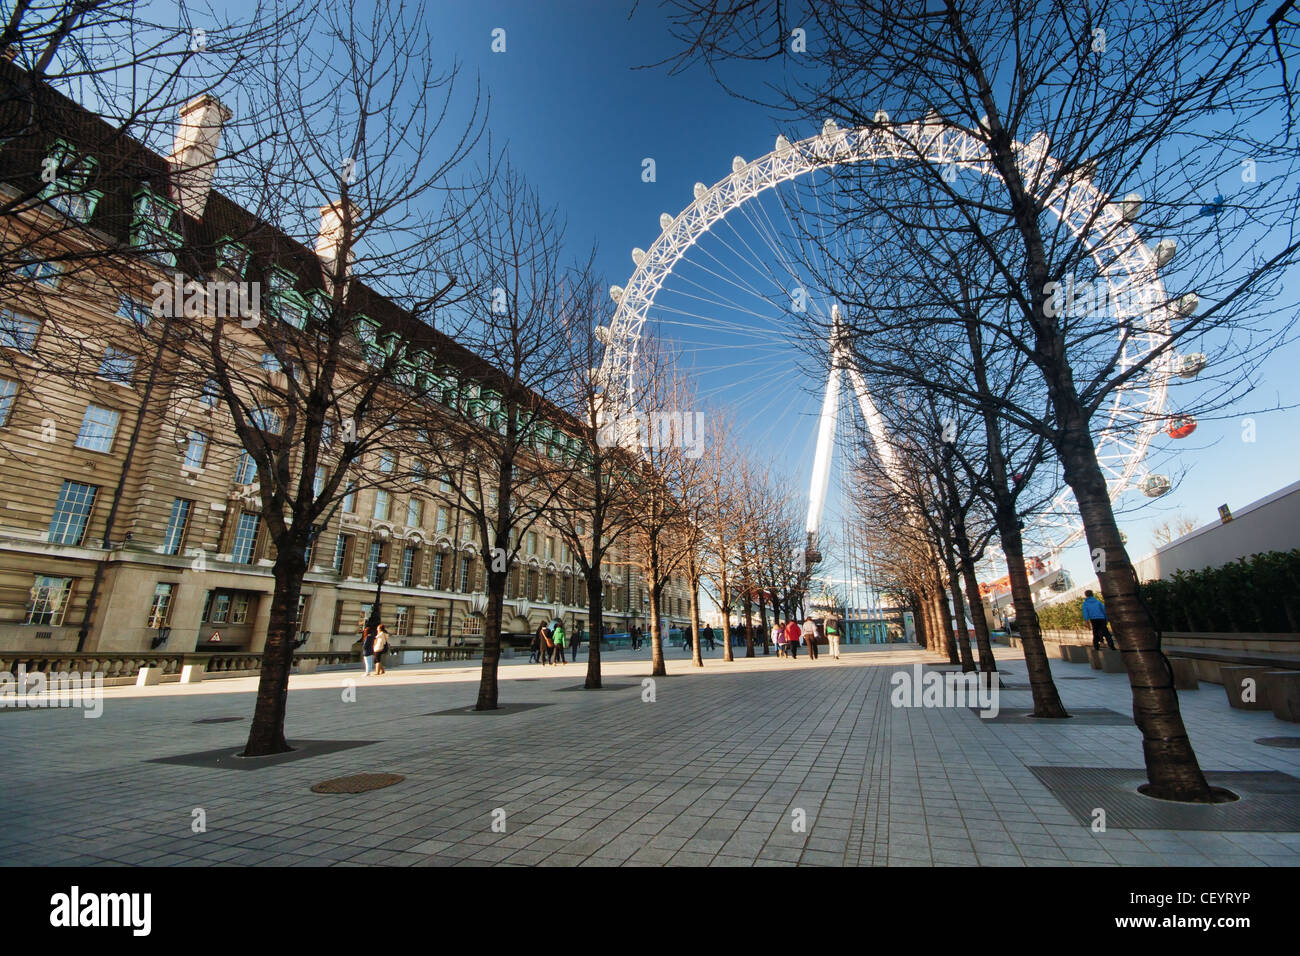 Tourists heading towards the London Eye in Lambeth - Stock Image